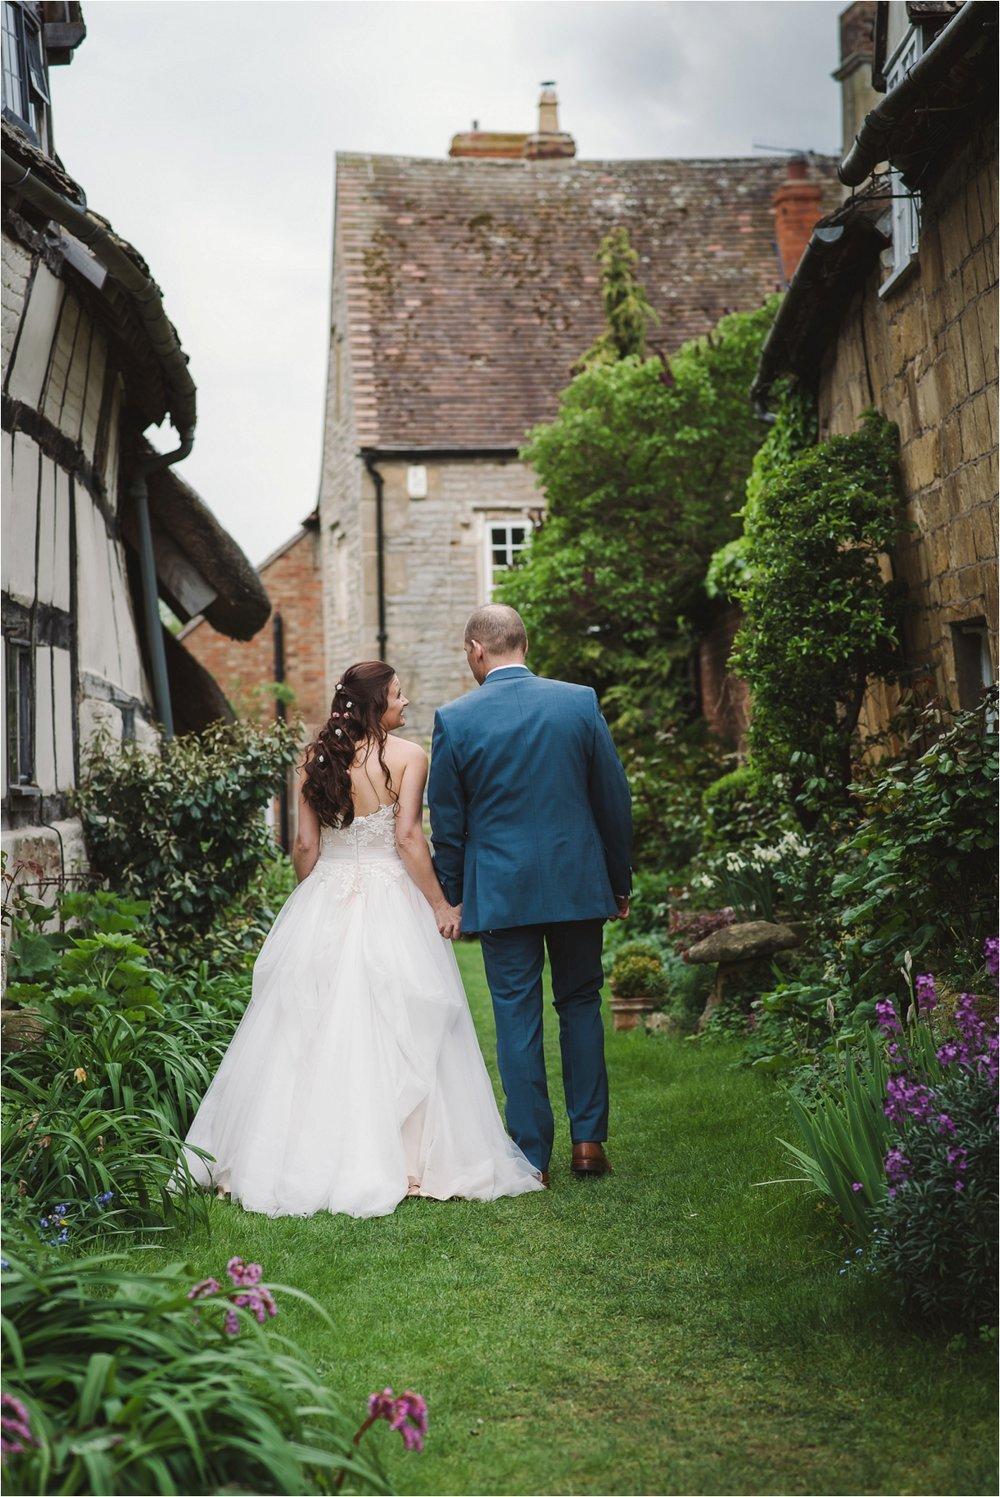 chris_emma_wedding_the_Fleece_inn_0069.jpg